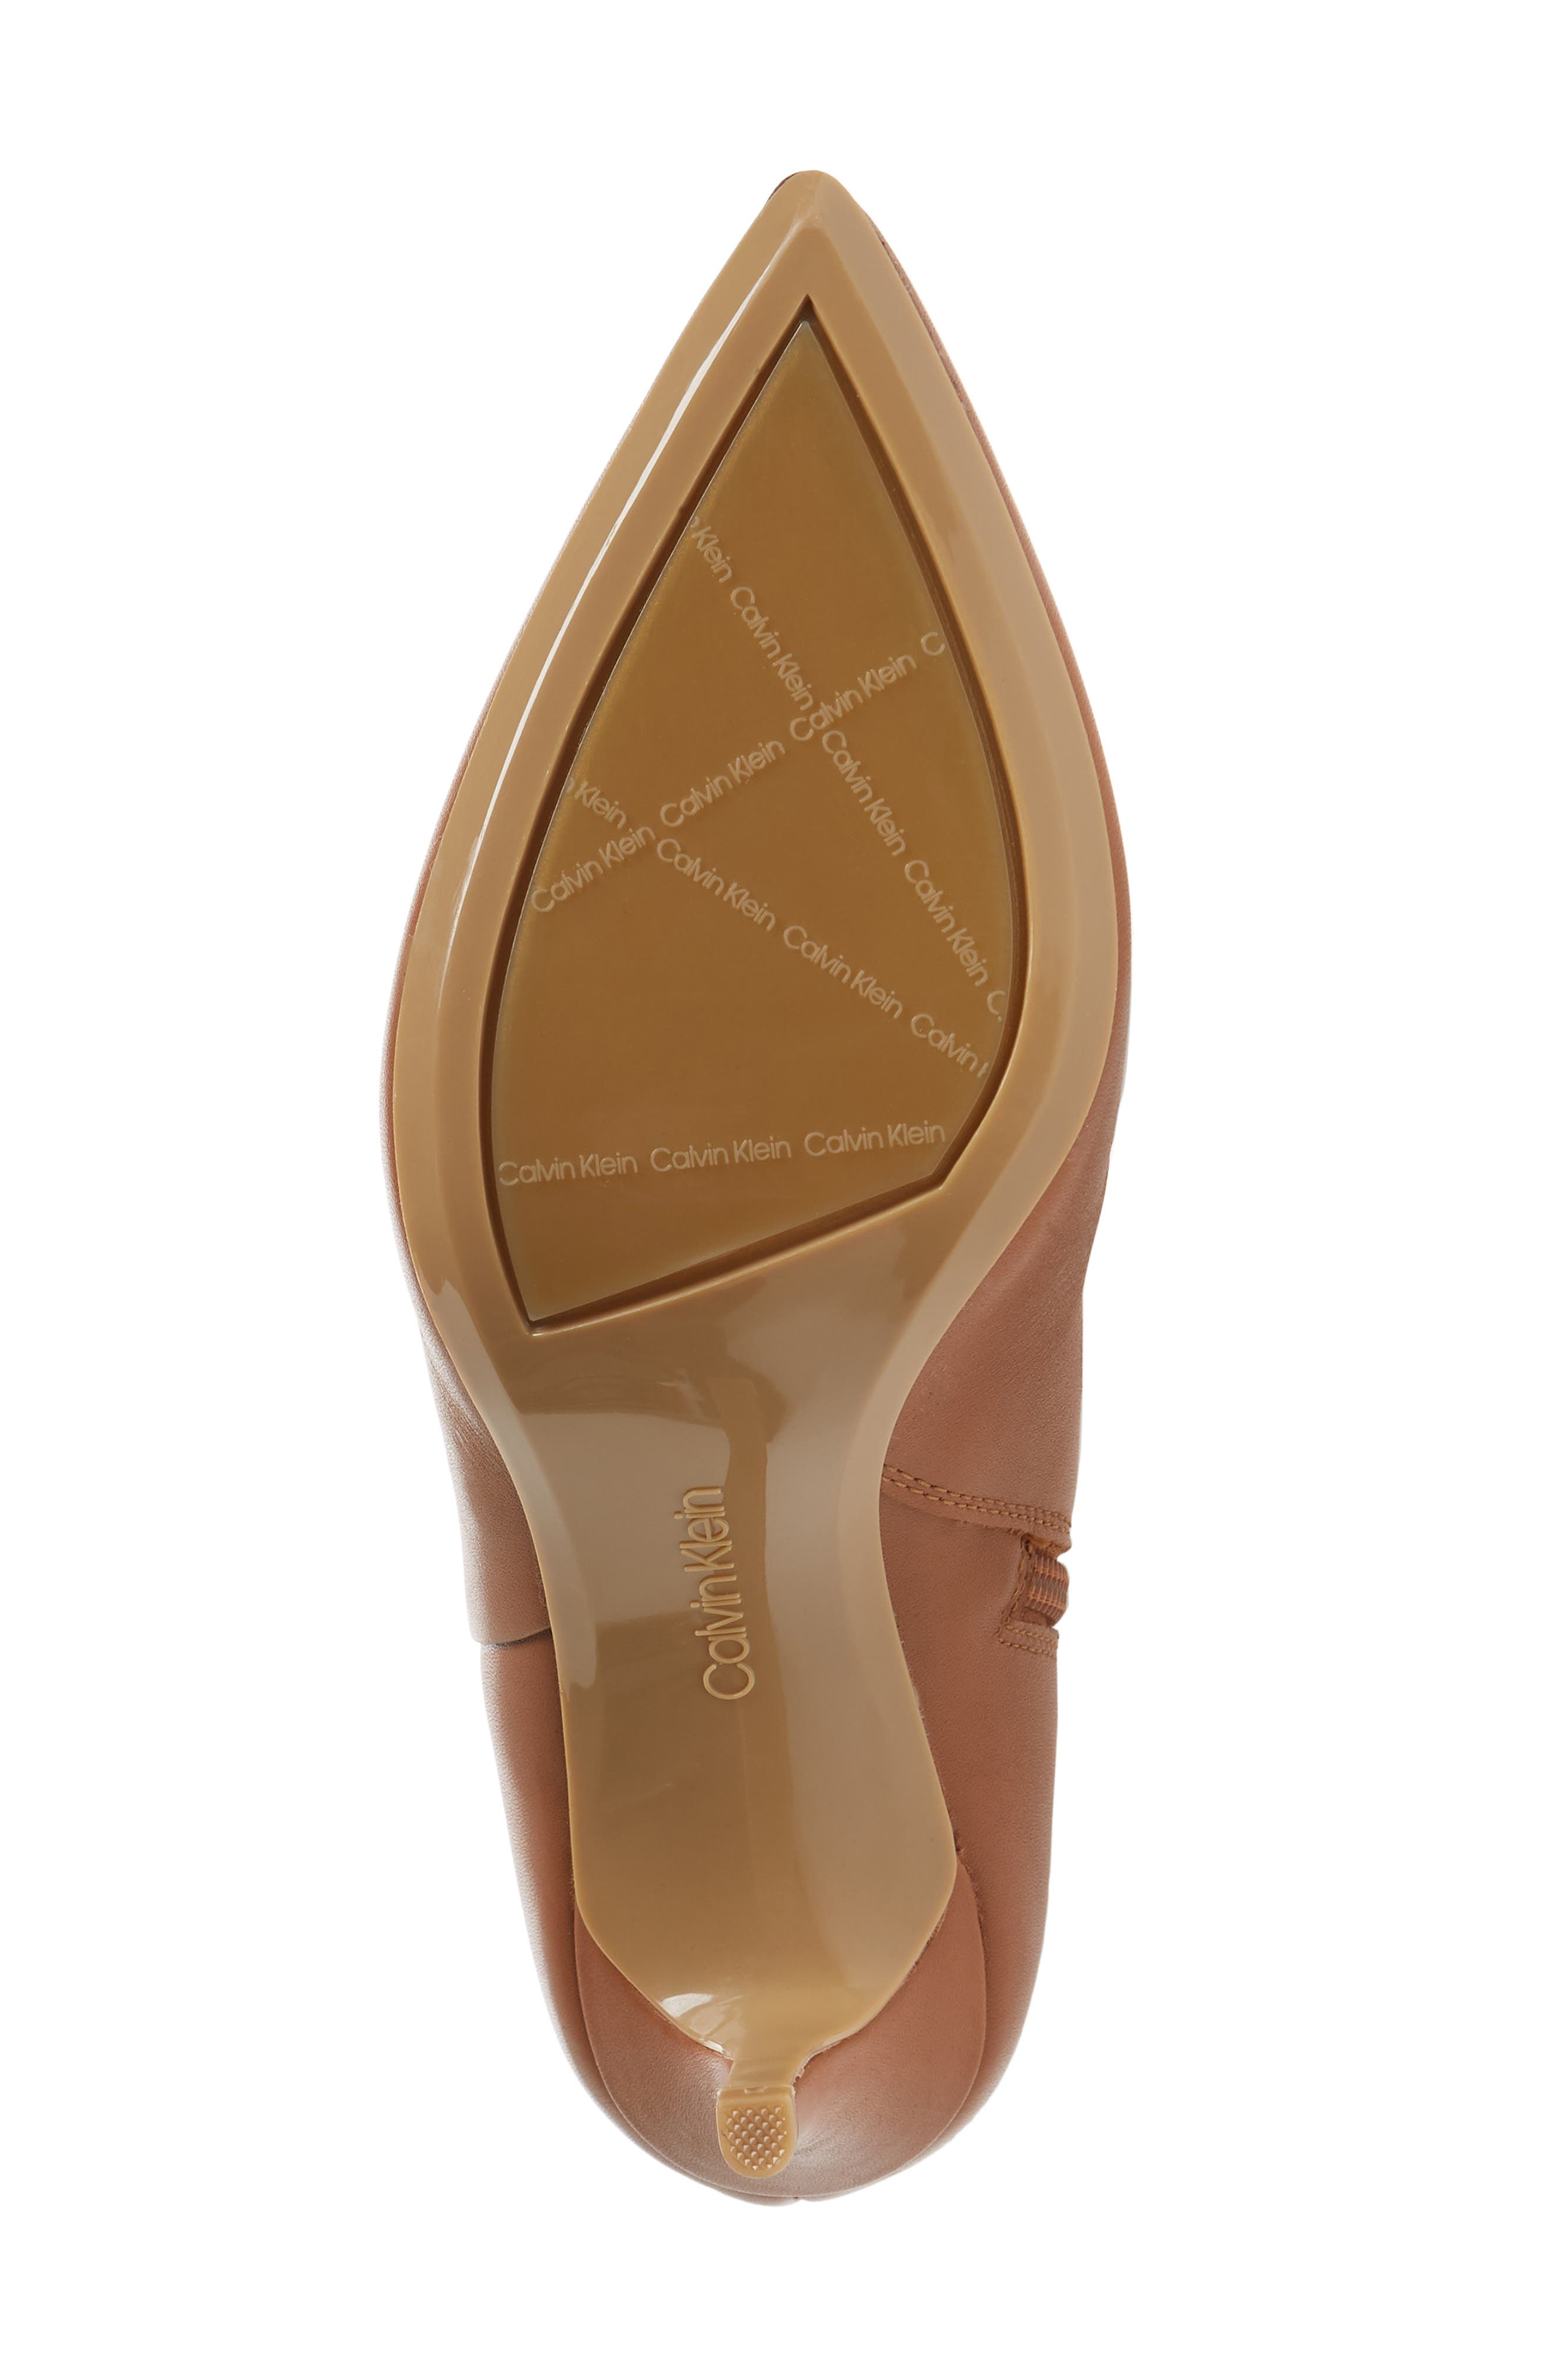 Glydia Stiletto Knee High Boot,                             Alternate thumbnail 6, color,                             COGNAC LEATHER